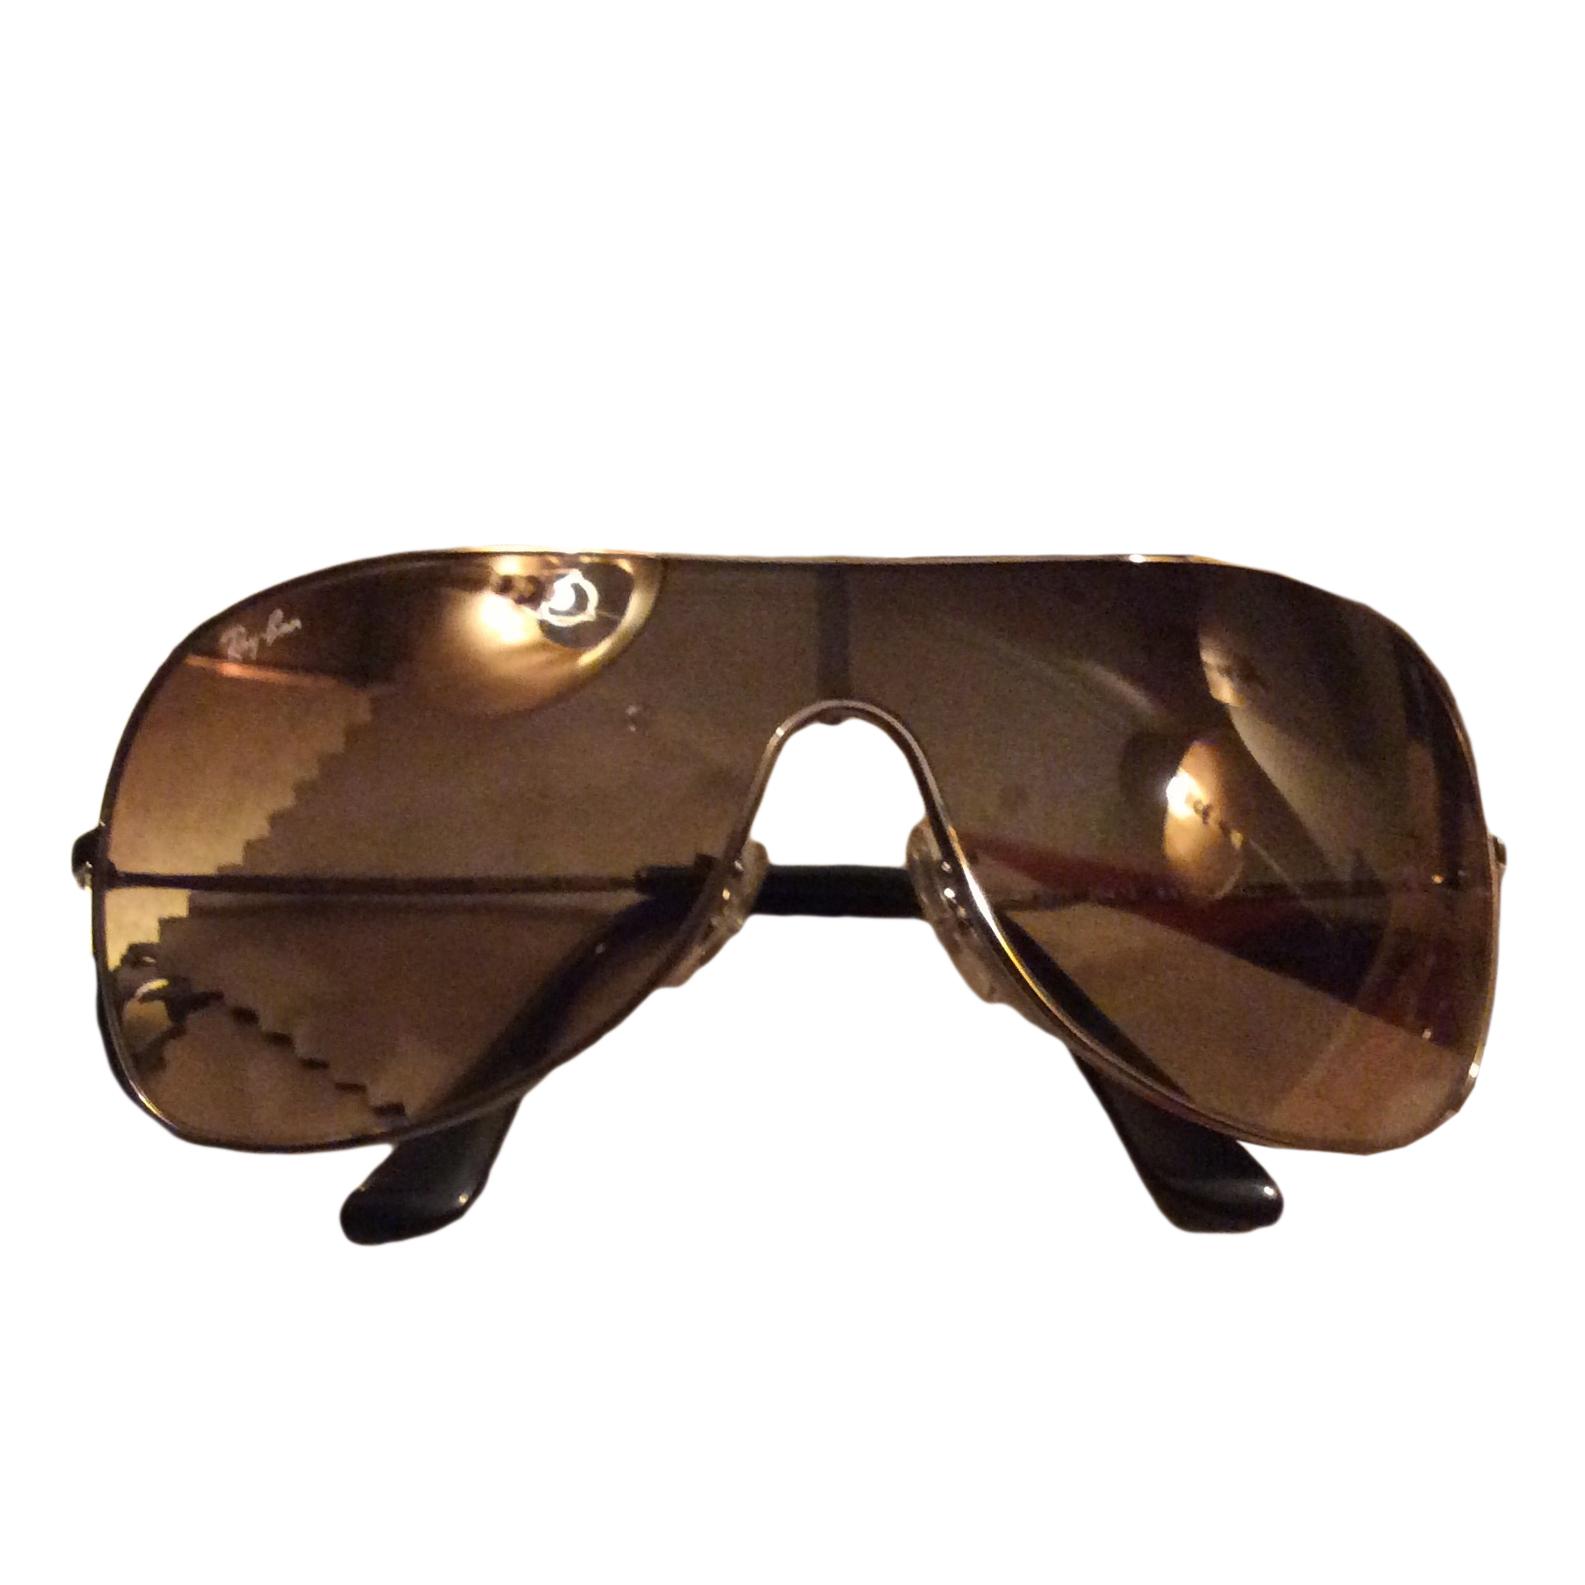 8231d4e9e5ed Ray Ban Sunglasses037232